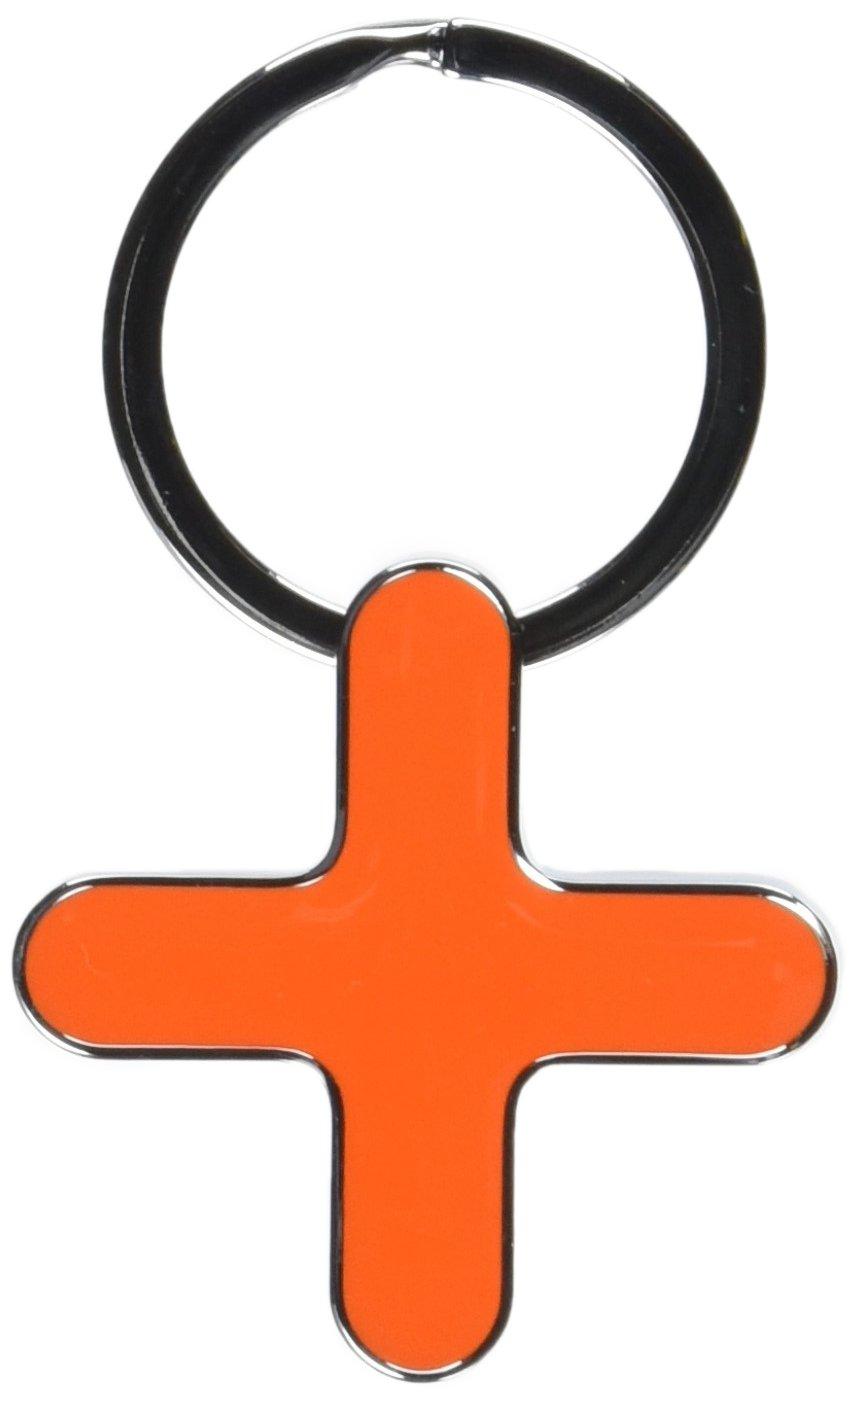 TROIKA (トロイカ) キーリング、ヌード、オレンジ KARIM RASHIDデザインキーホルダー RK001/OR NODE B005550E9M